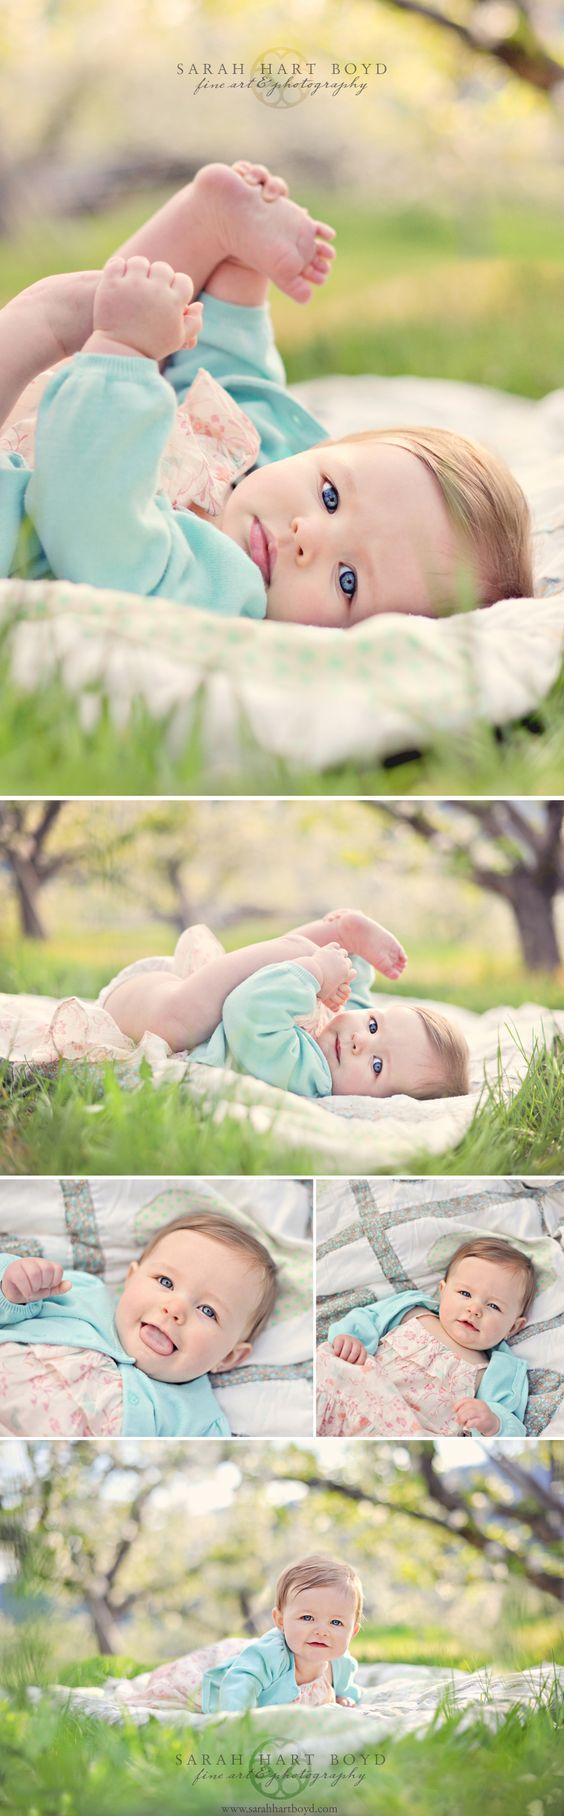 Alexandria ( 7 months ) – Apple Blossom Portraits – Manson, WA » sarahhartboyd.com